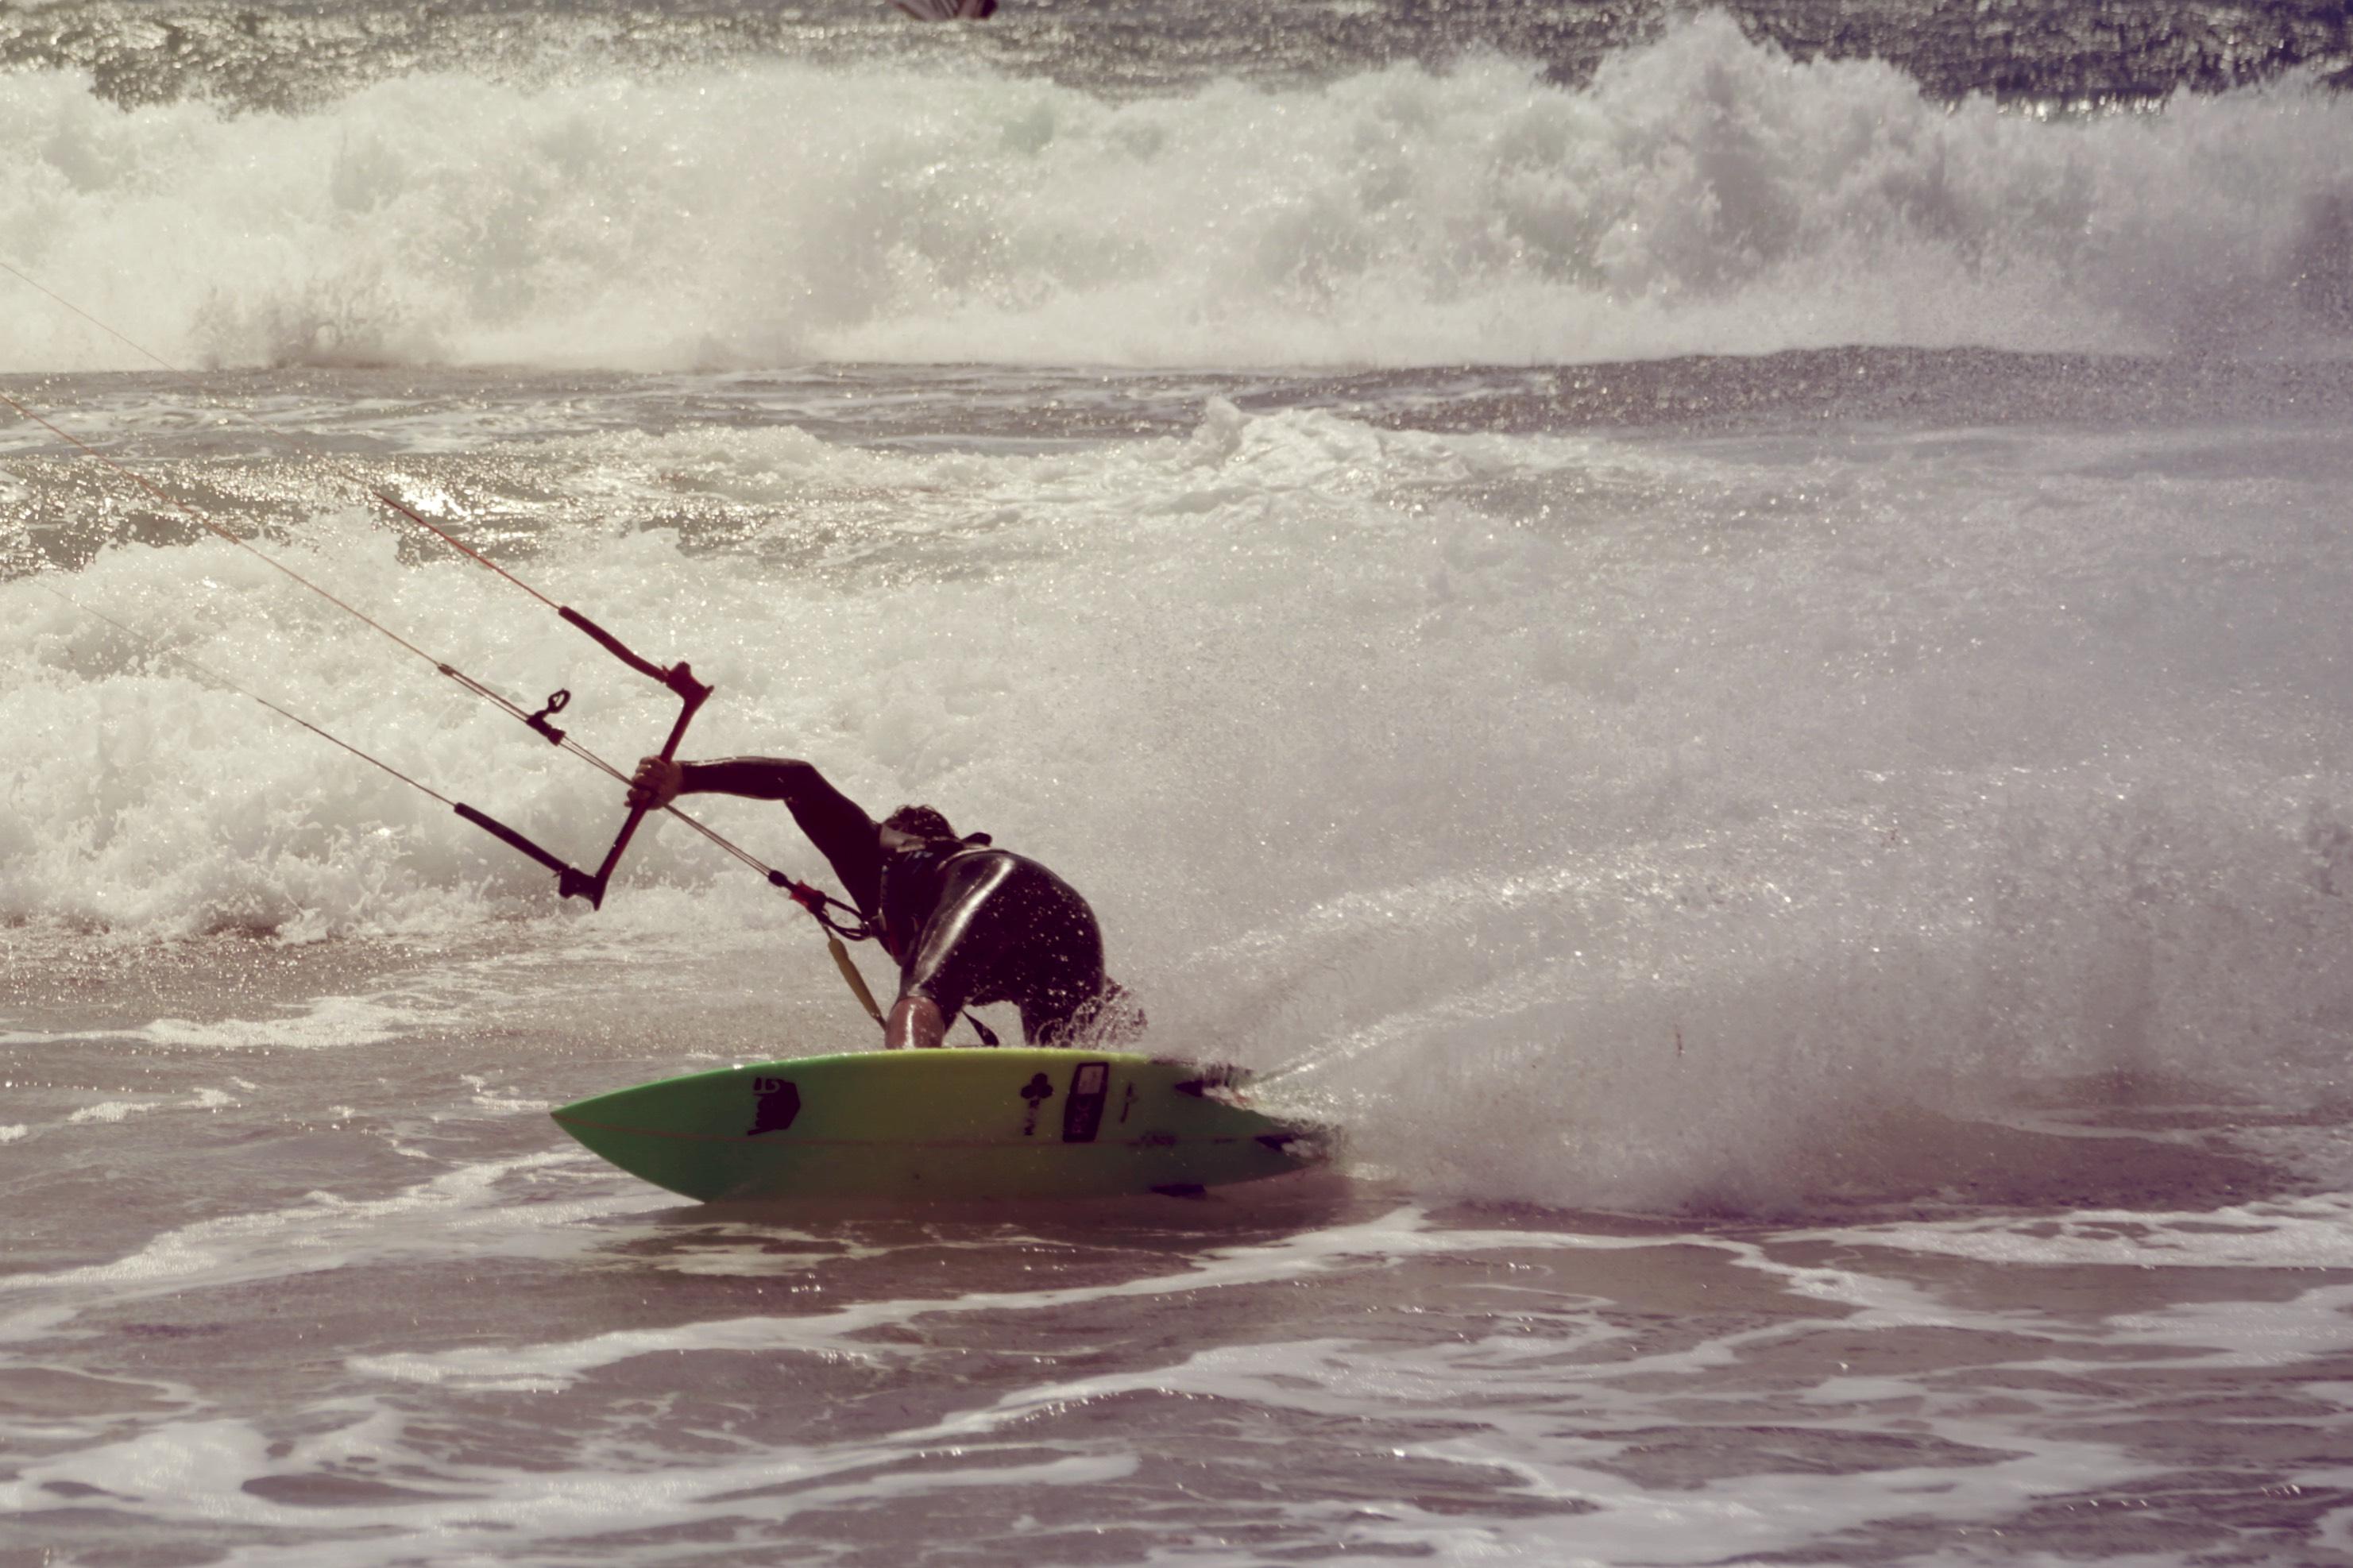 _P8B2668_Tarifa_Surfing_Jarek_Raczek_WEB_01